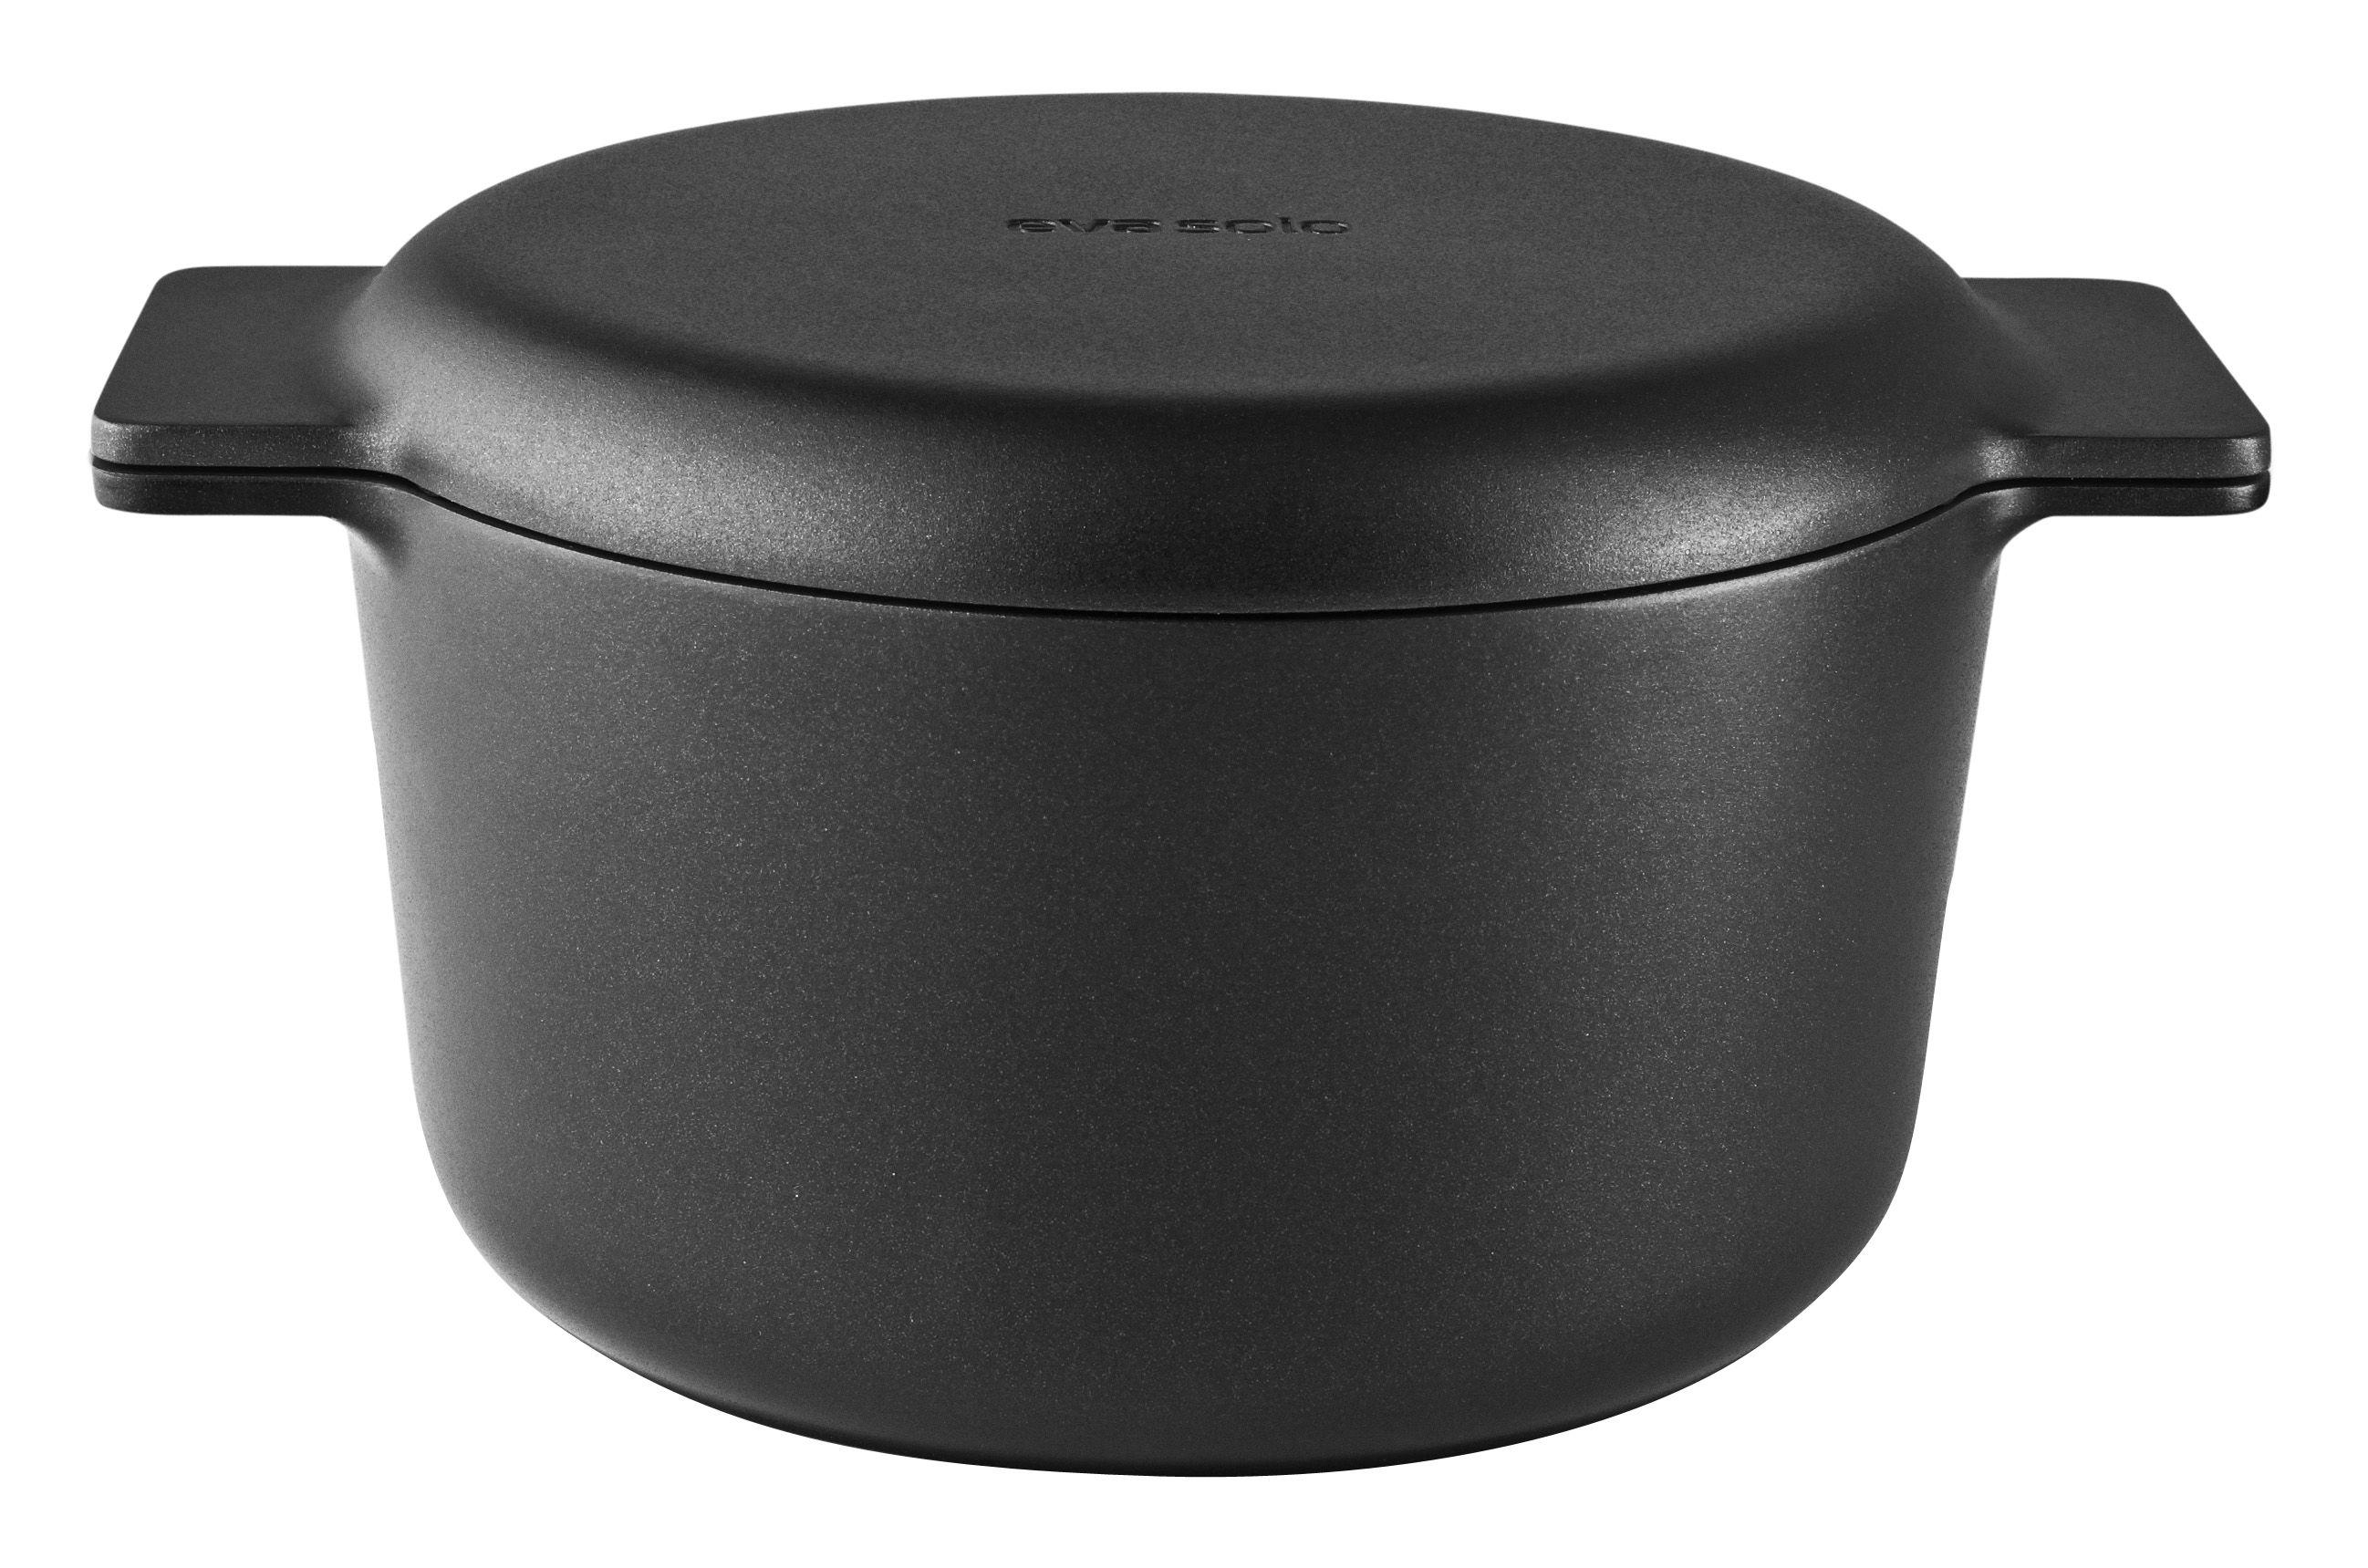 Kitchenware - Pots & Pans - Nordic Kitchen Stew pot - 3 L - Non-stick by Eva Solo - Black - Aluminium